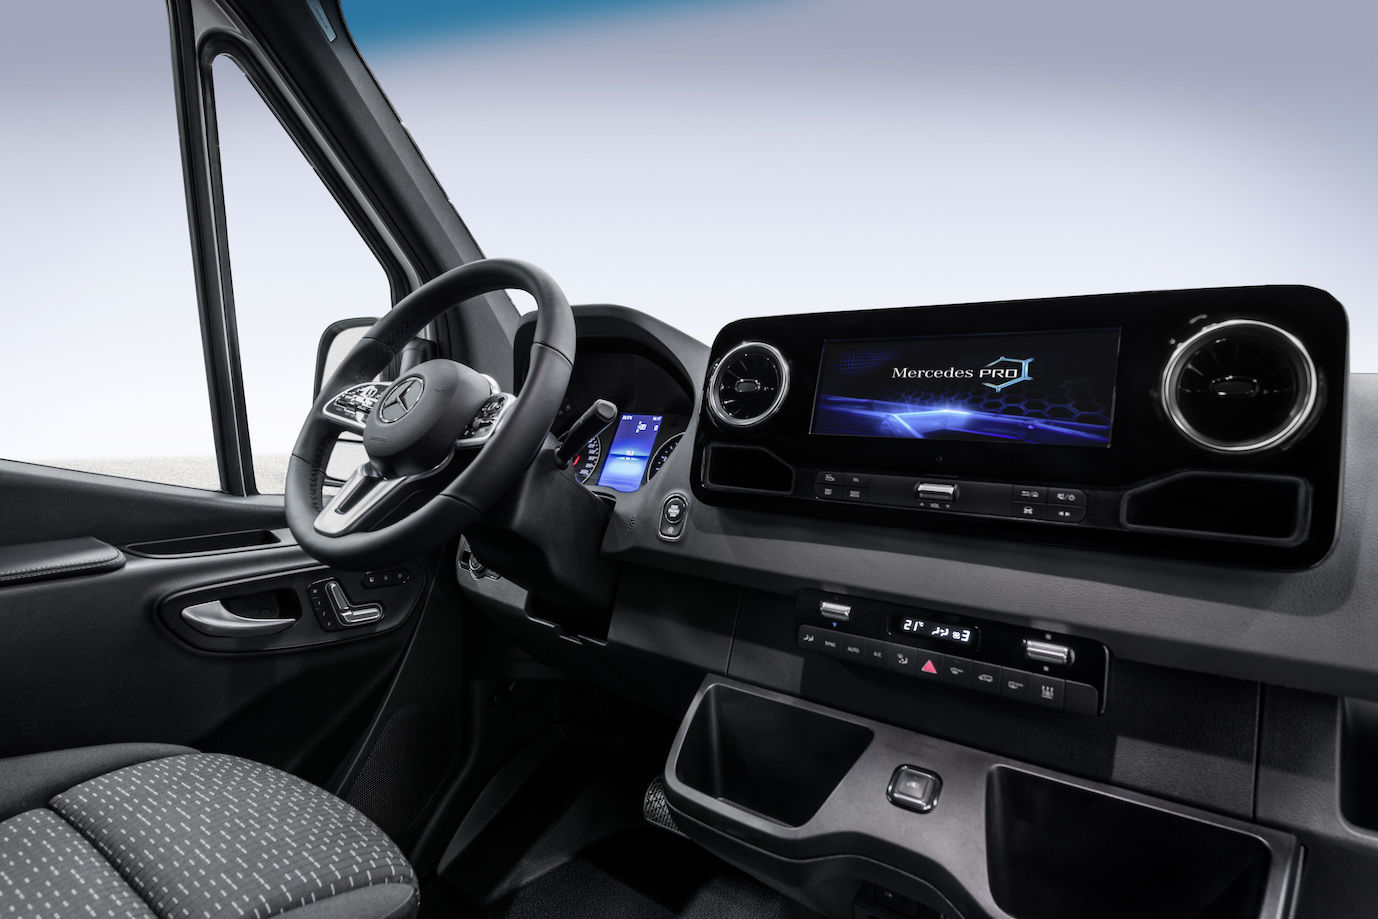 2018 Mercedes-Benz Sprinter interior